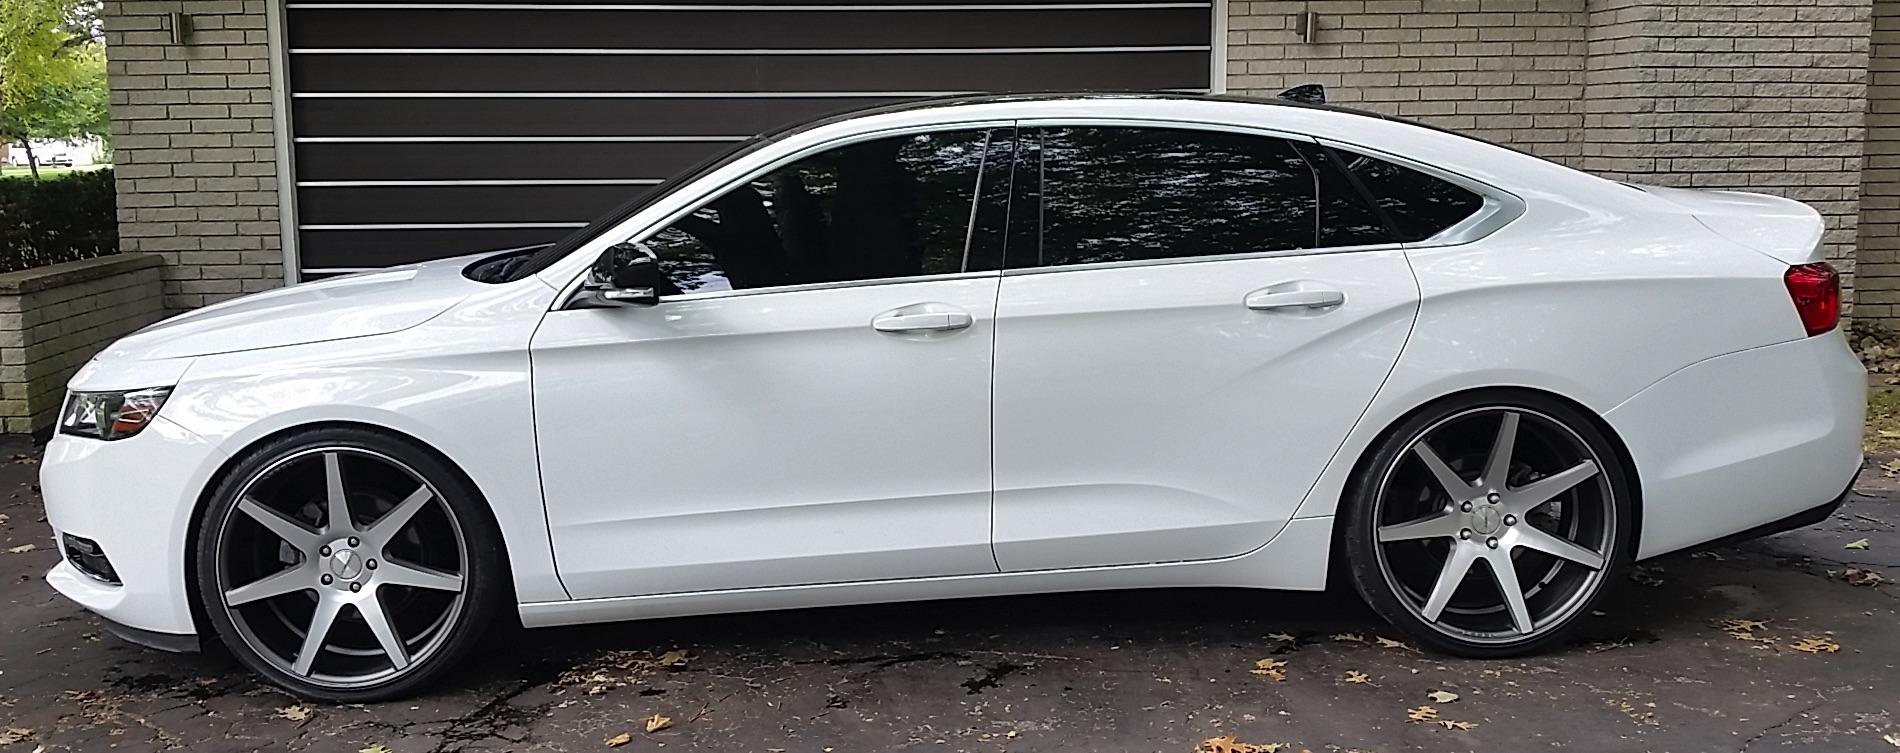 Eibach 2015 Impala Lowering Kit - Group Buy - Chevy Impala Forums